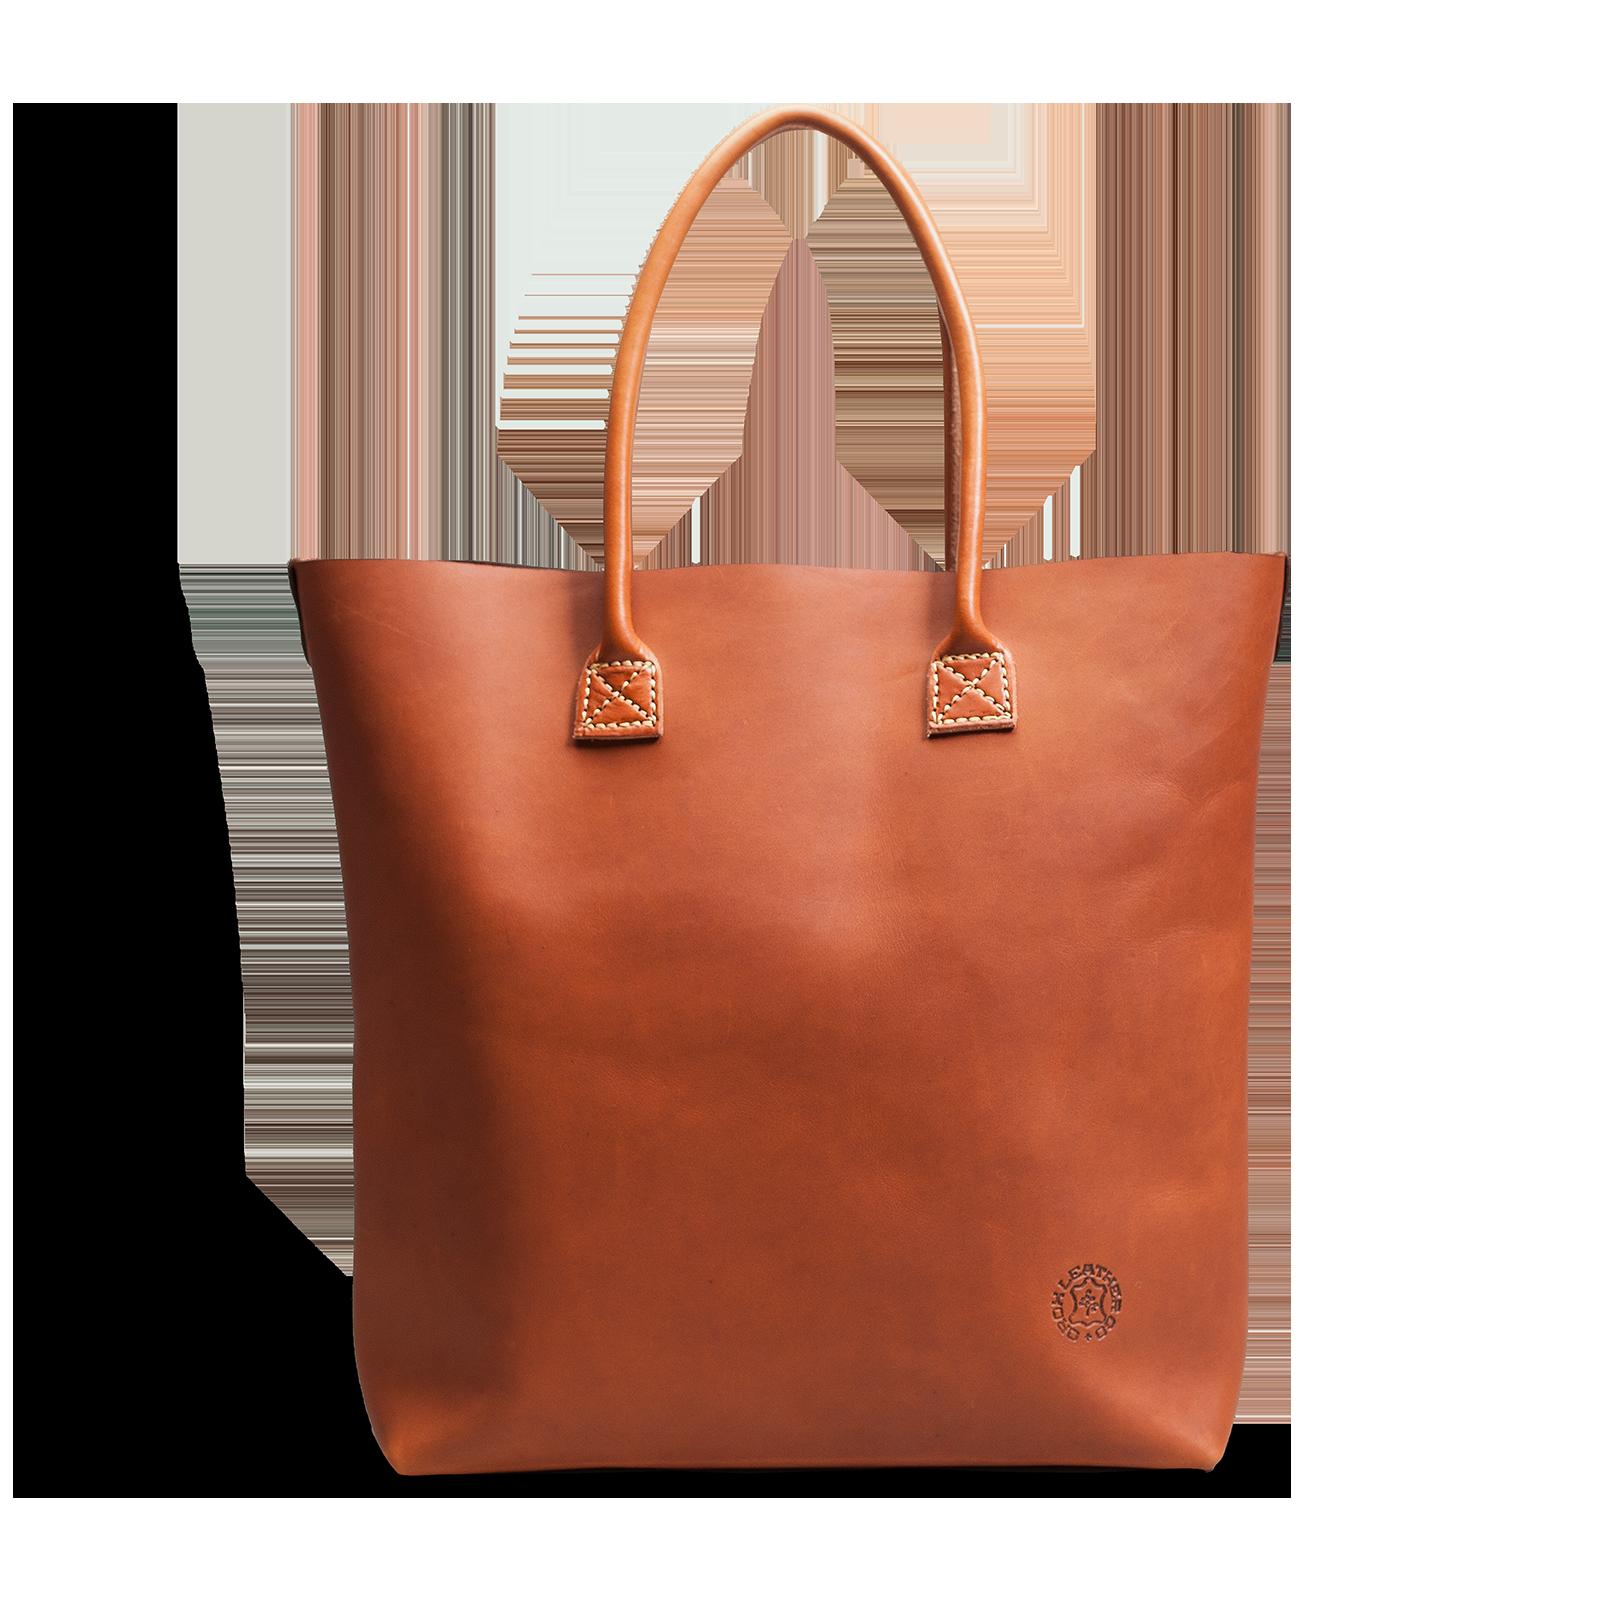 2cd168e49e8 Merces Tote - Tan   Products   Bags, Tan leather, Tote bag